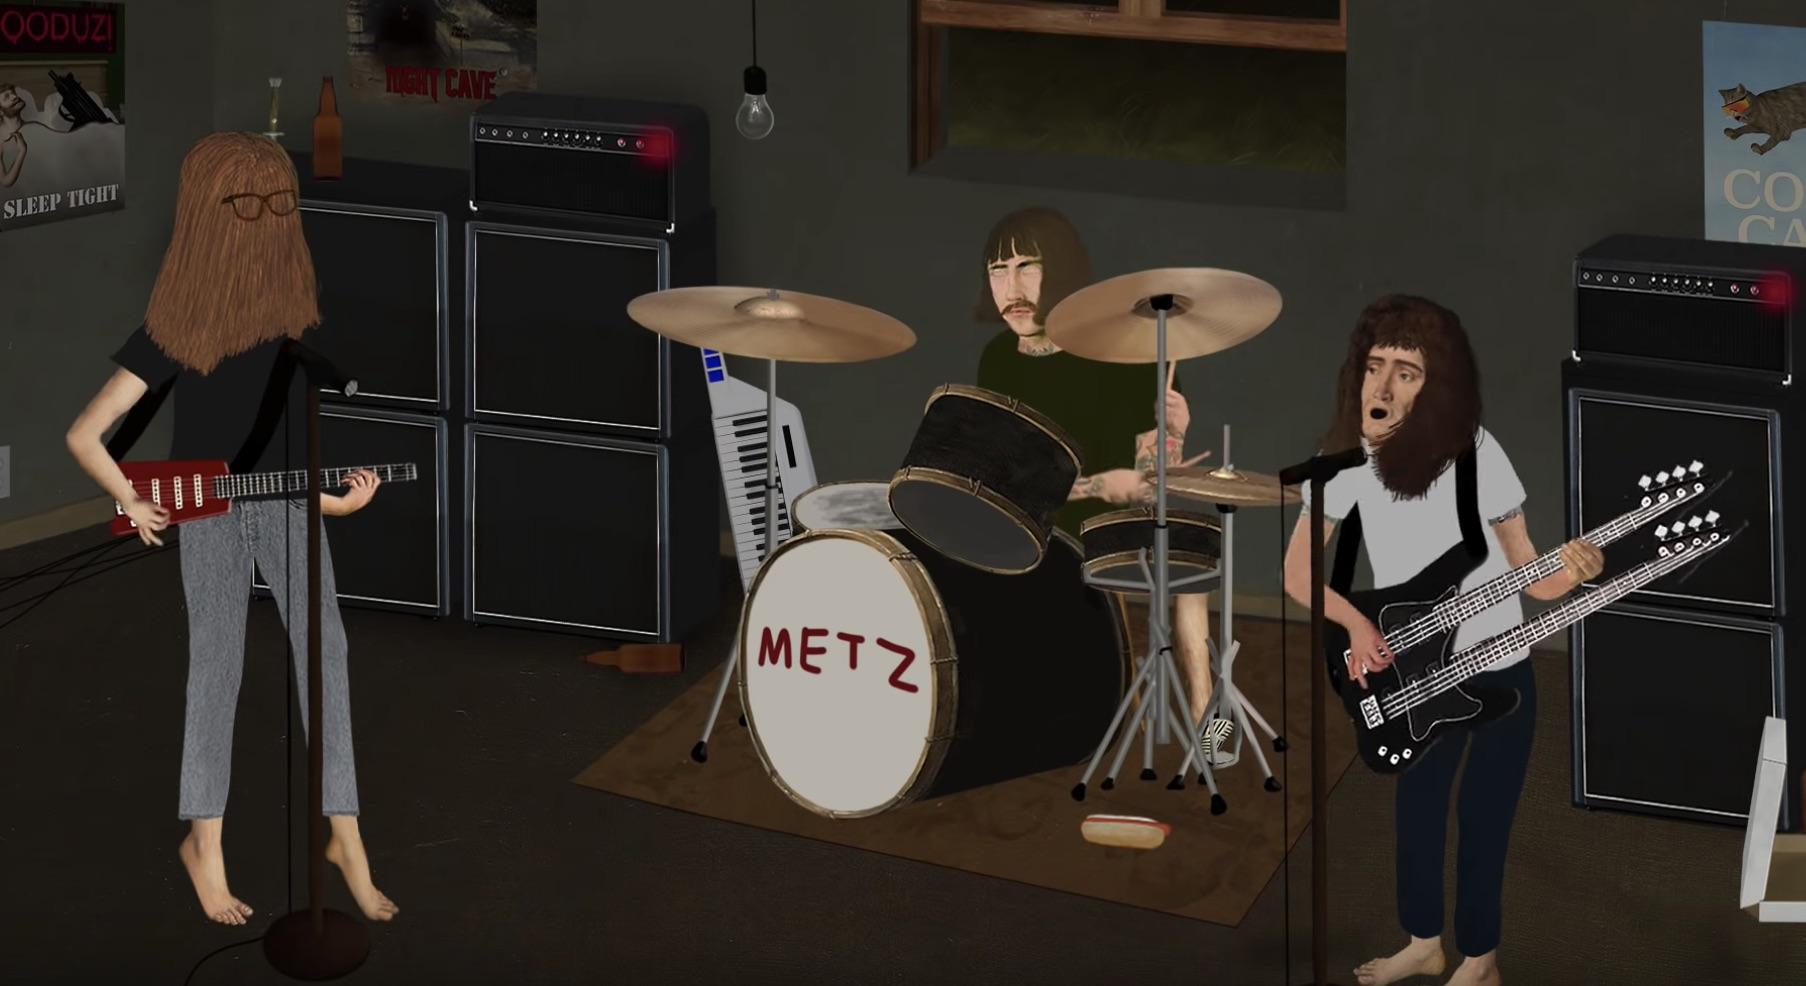 metz pure auto animation music video automat